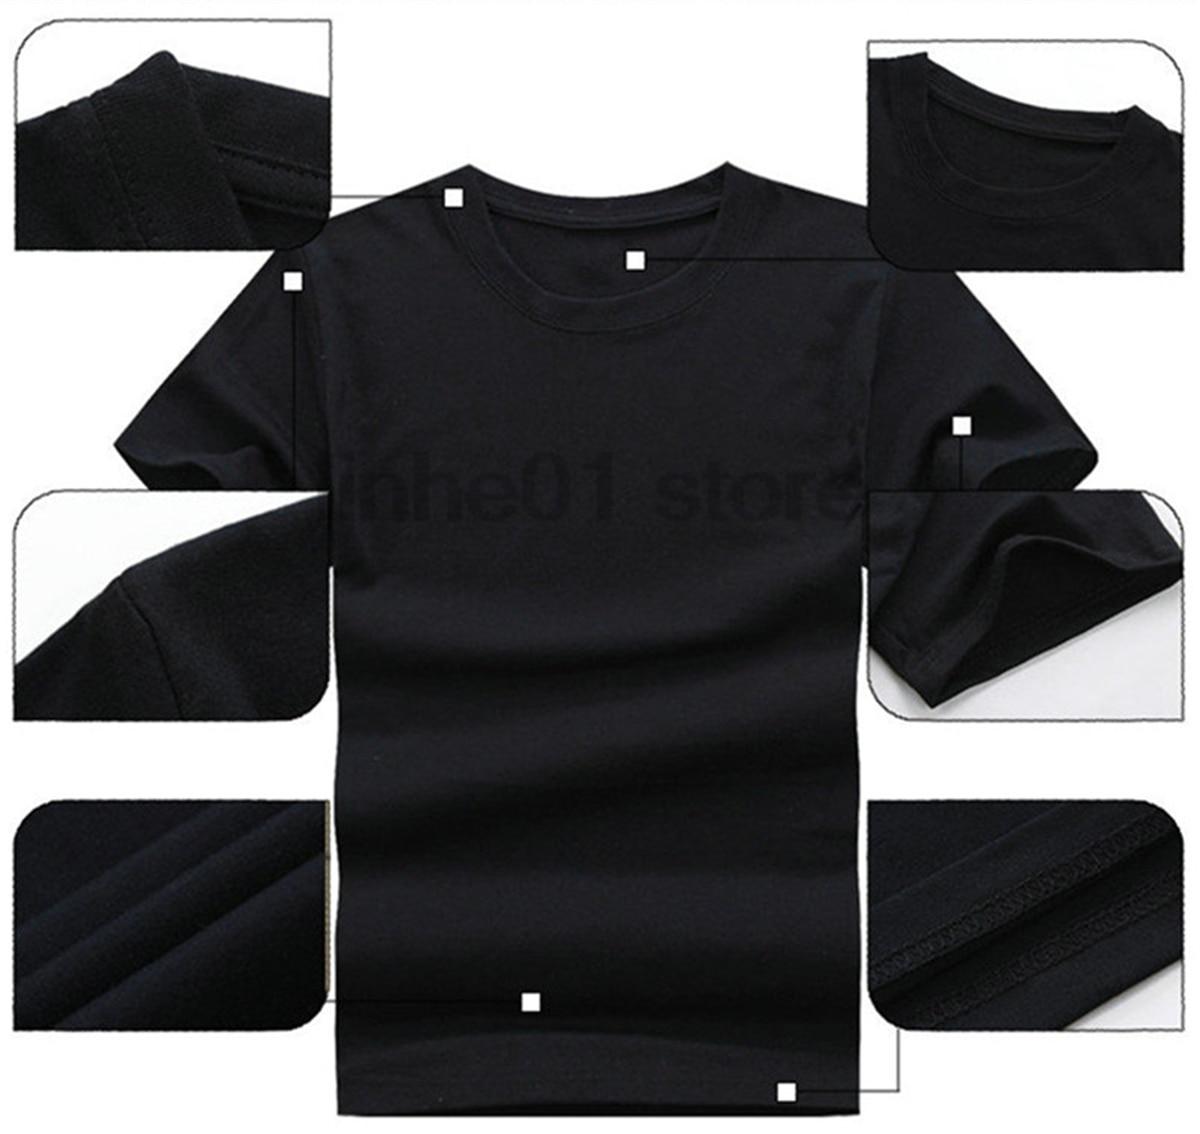 Возьмите Кристиан футболка принятие Made Me мама Кристиан футболка подарок Горячие Для женщин футболка летнее платье футболка